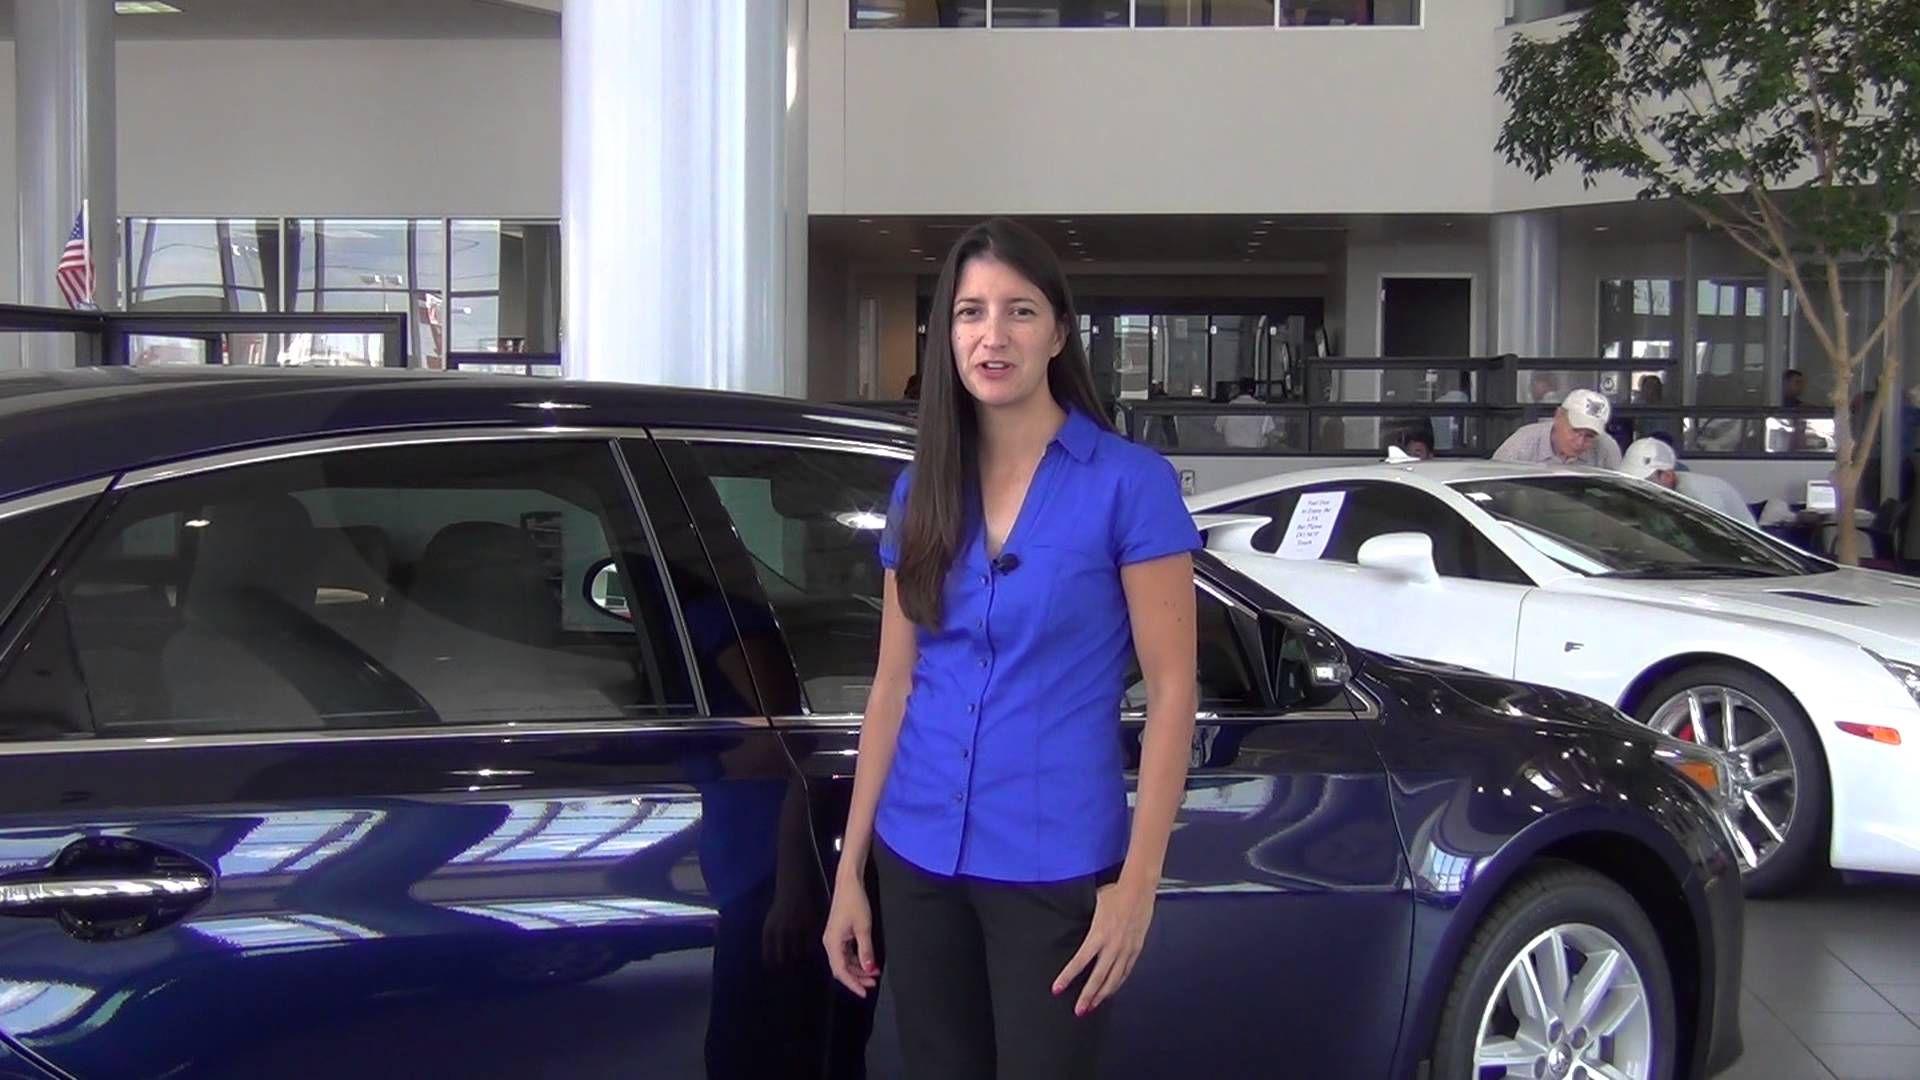 tomball tx 2014 toyota auto leasing lease vs missouri city